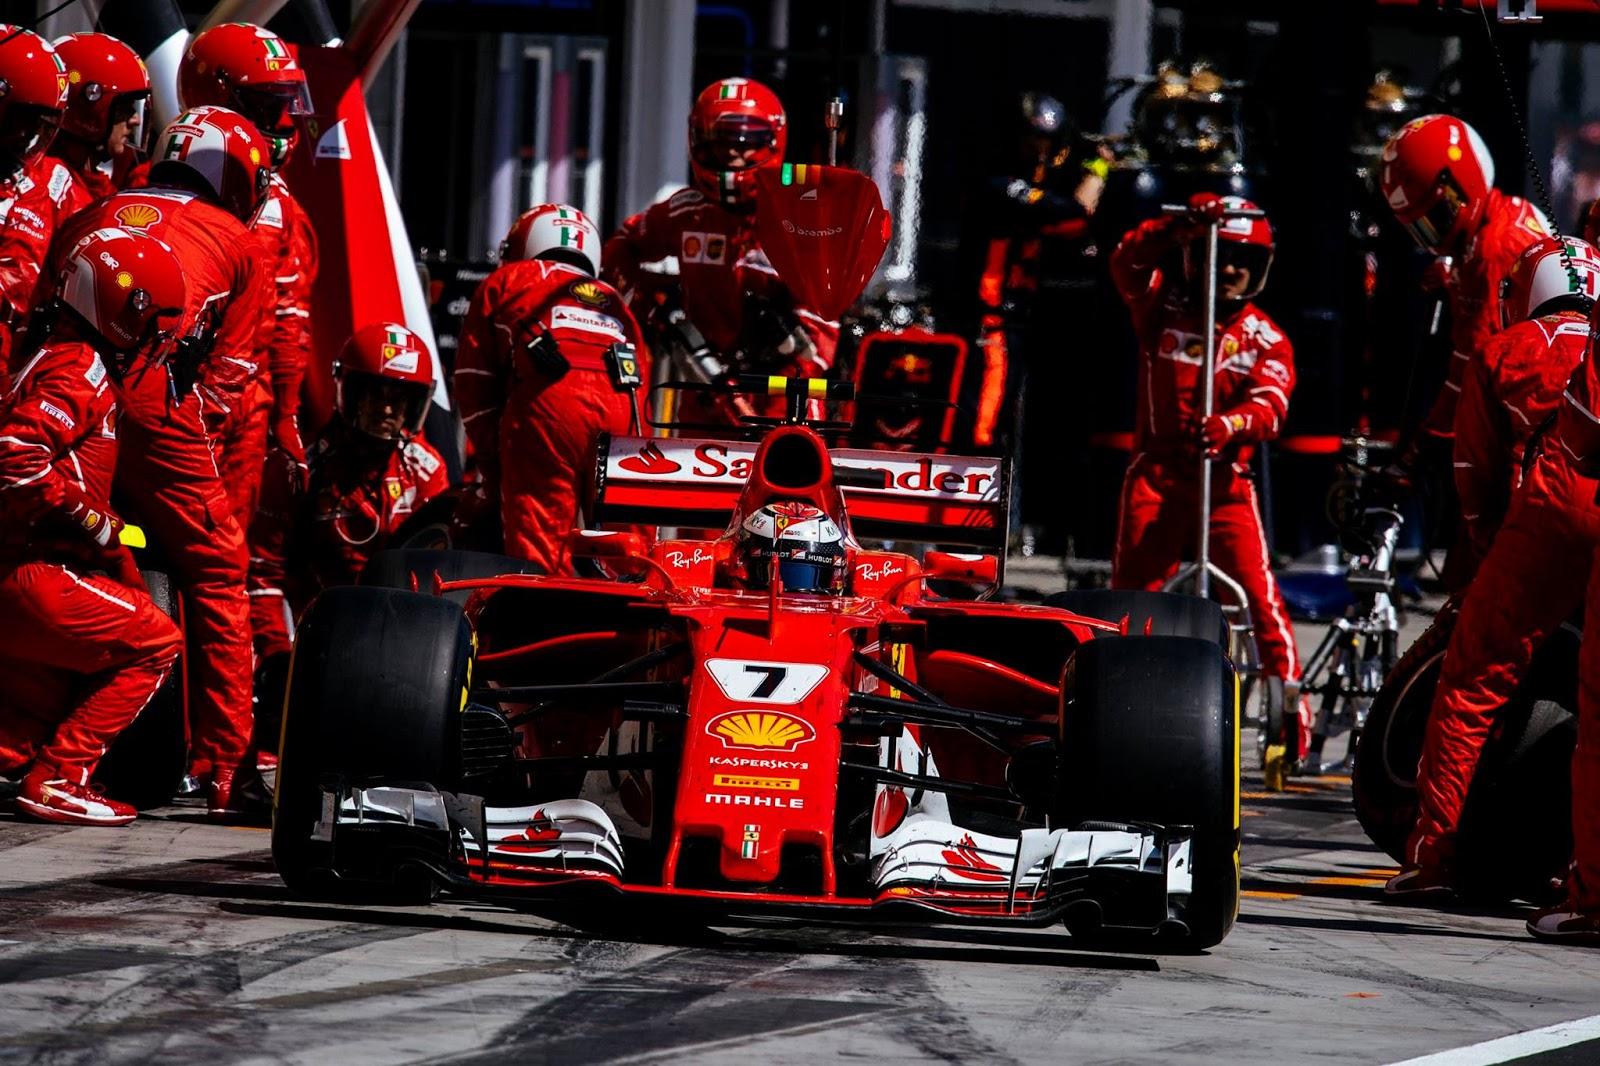 F1: Ferrari To Unveil 2018 F1 Car On February 22